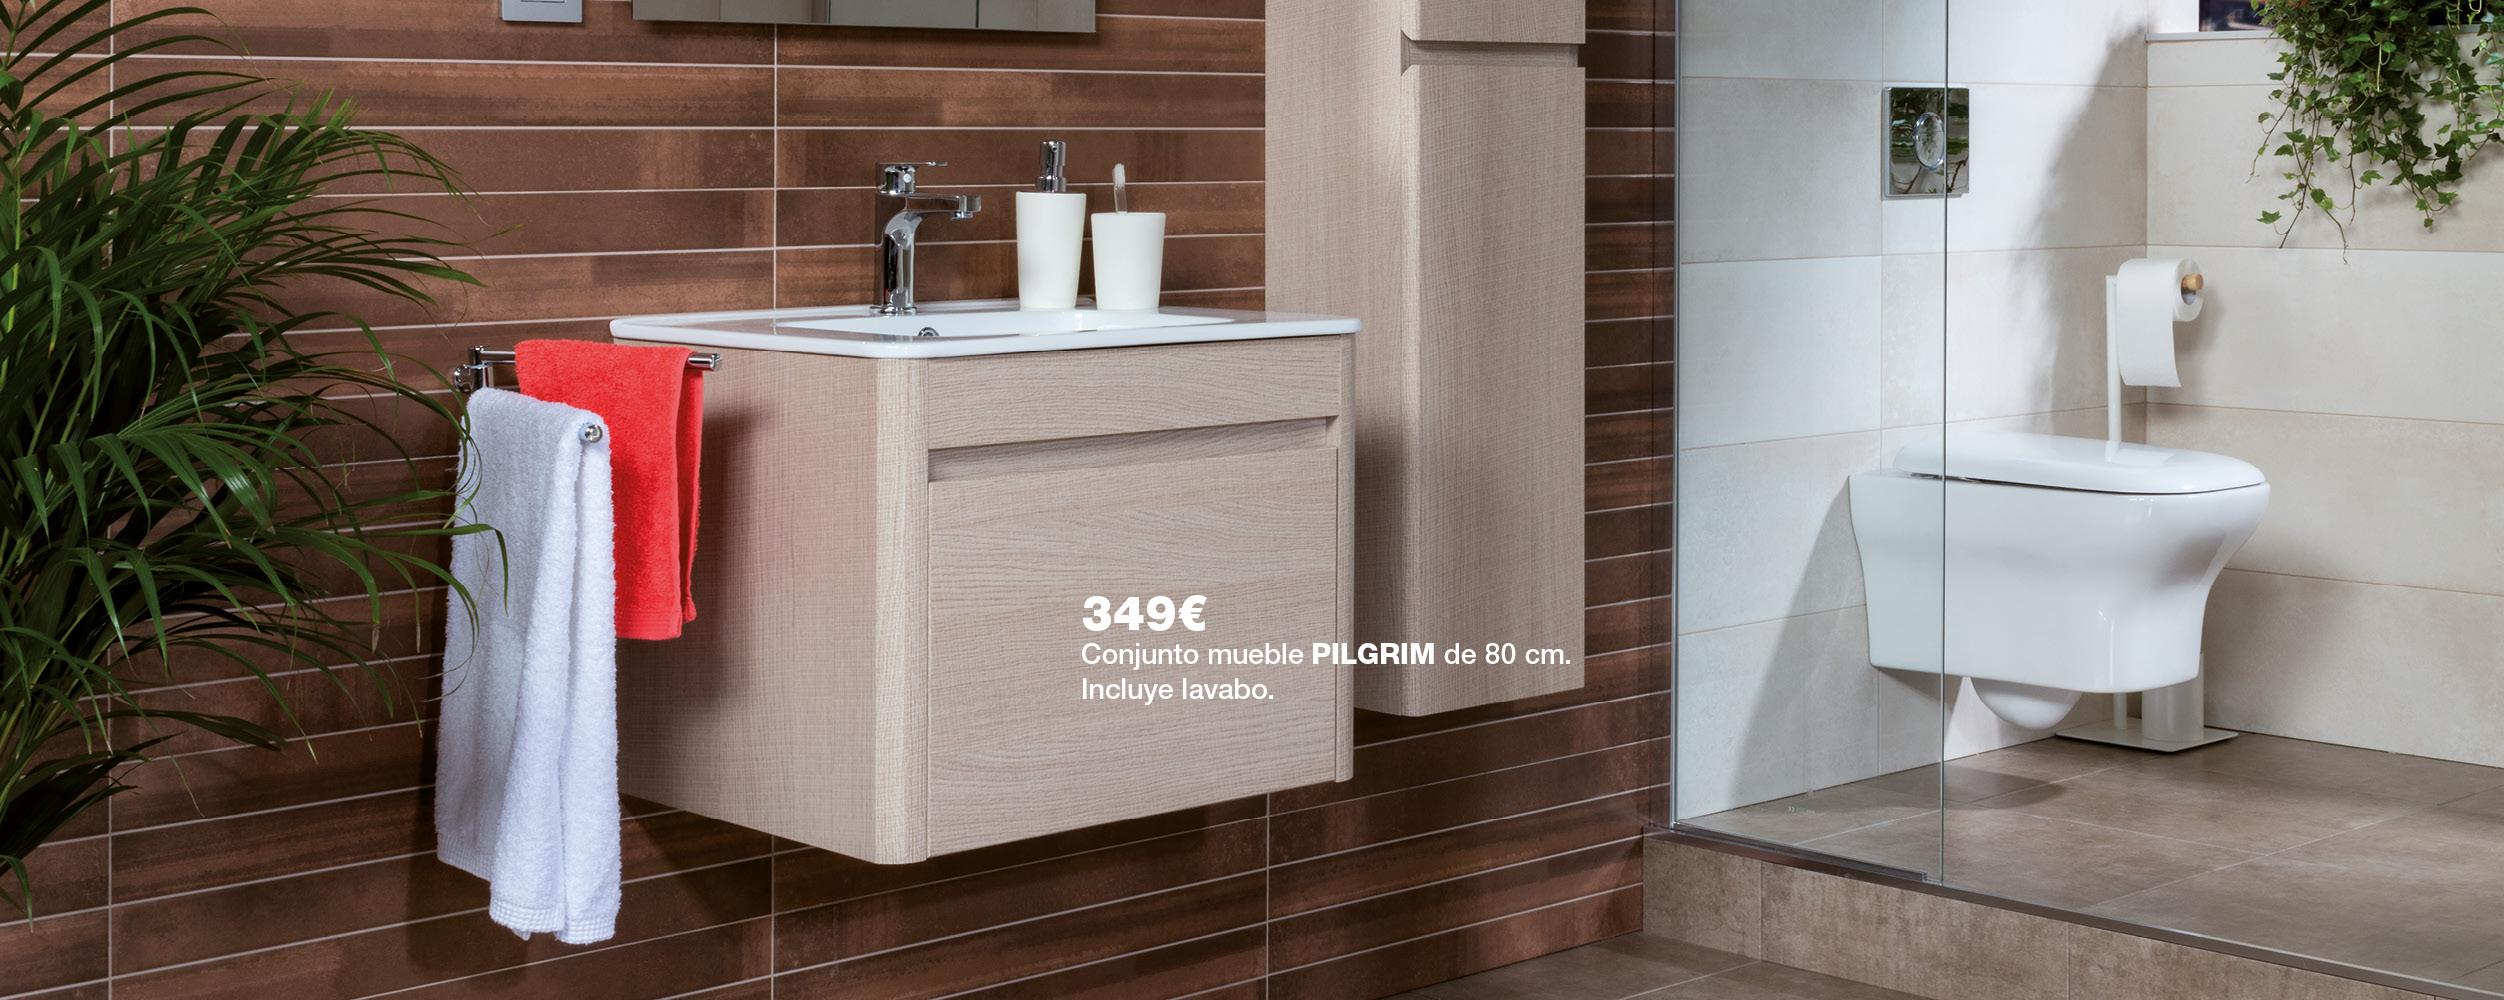 Mueble PILGRIM de 80 cm por 349€